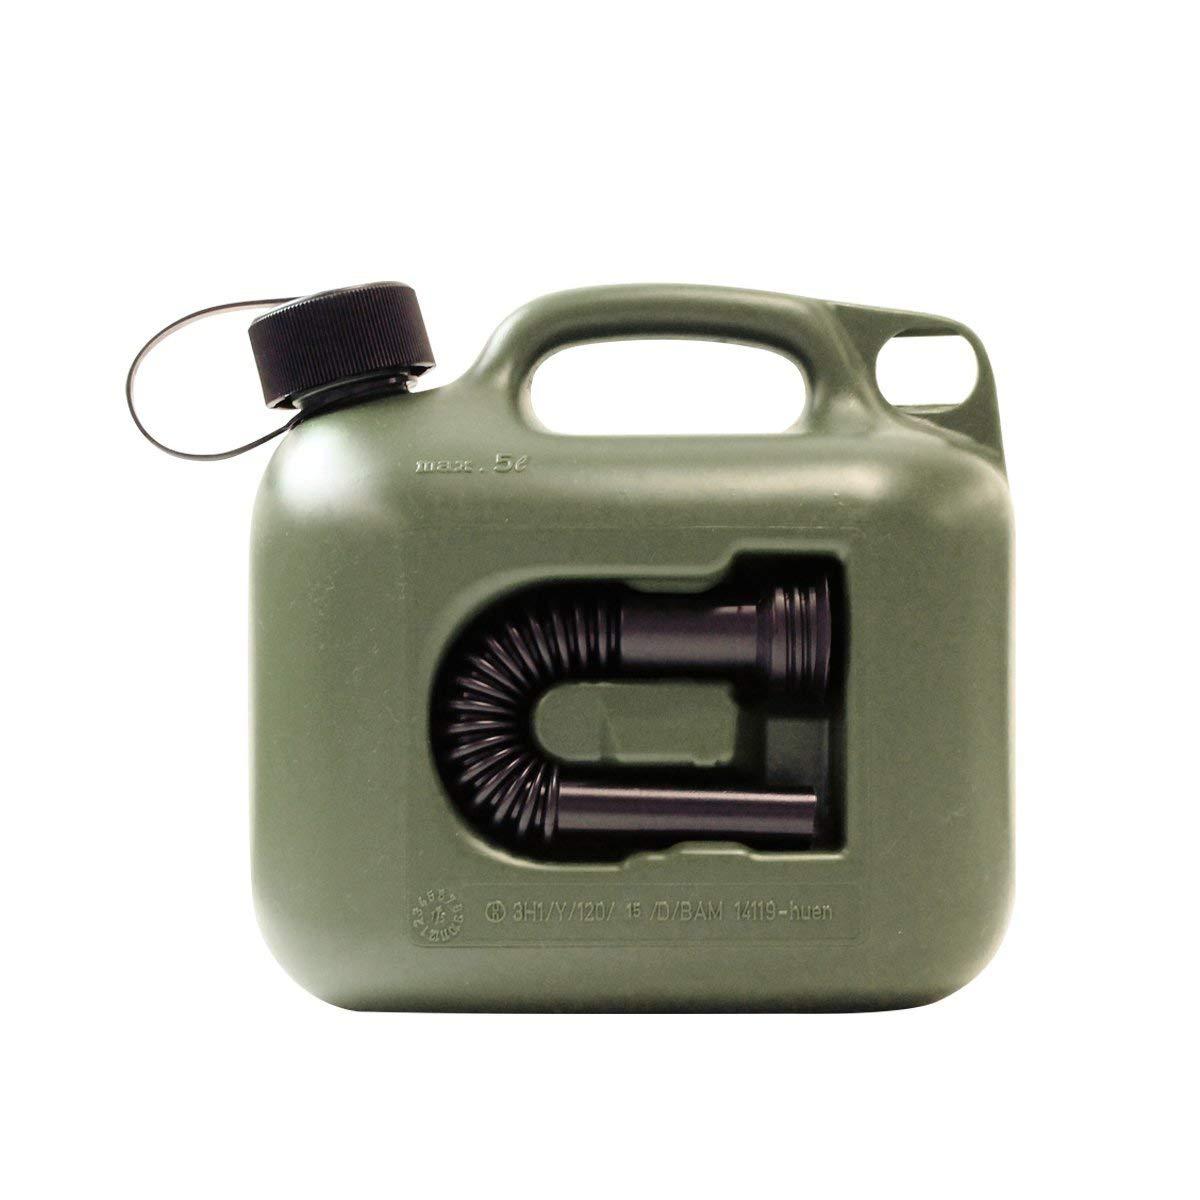 hunersdorff(ヒューナスドルフ)/Fuel Can Pro 5L